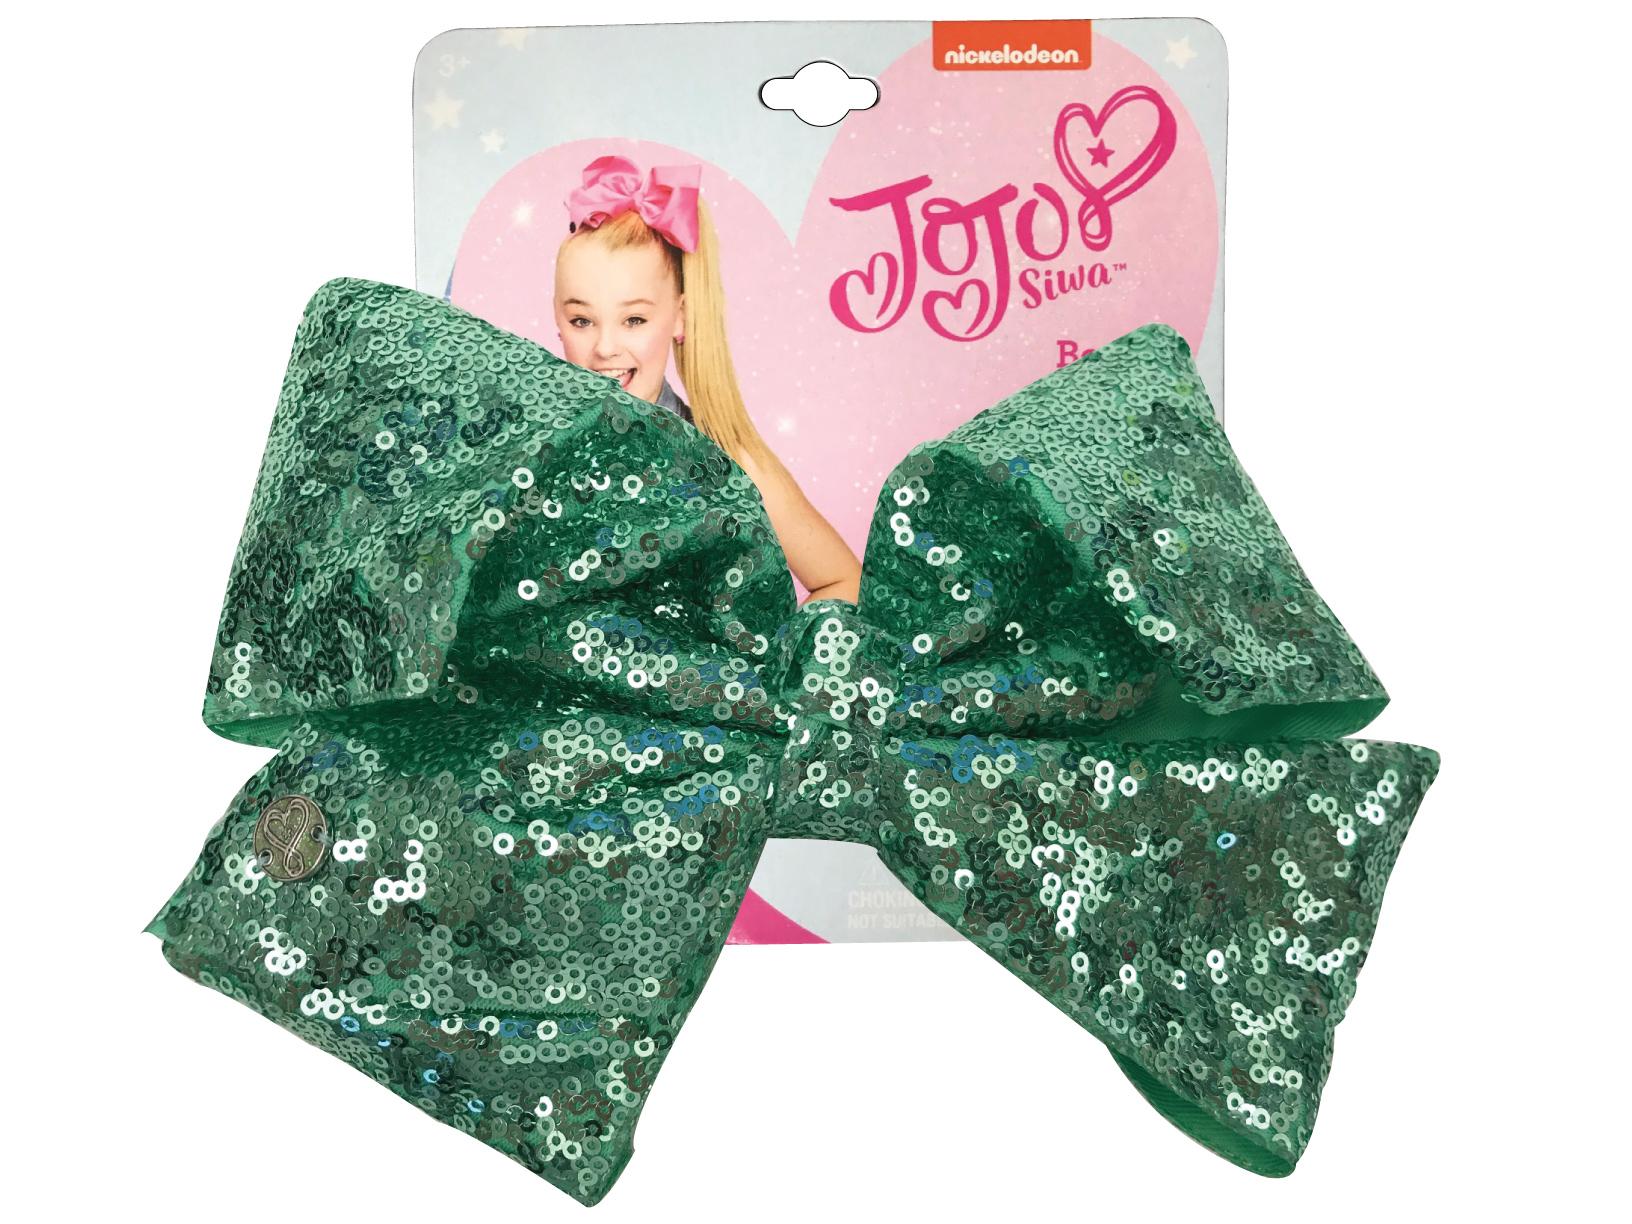 JoJo Siwa Large Cheer Hair Bow (Seafoam Green Sequined)